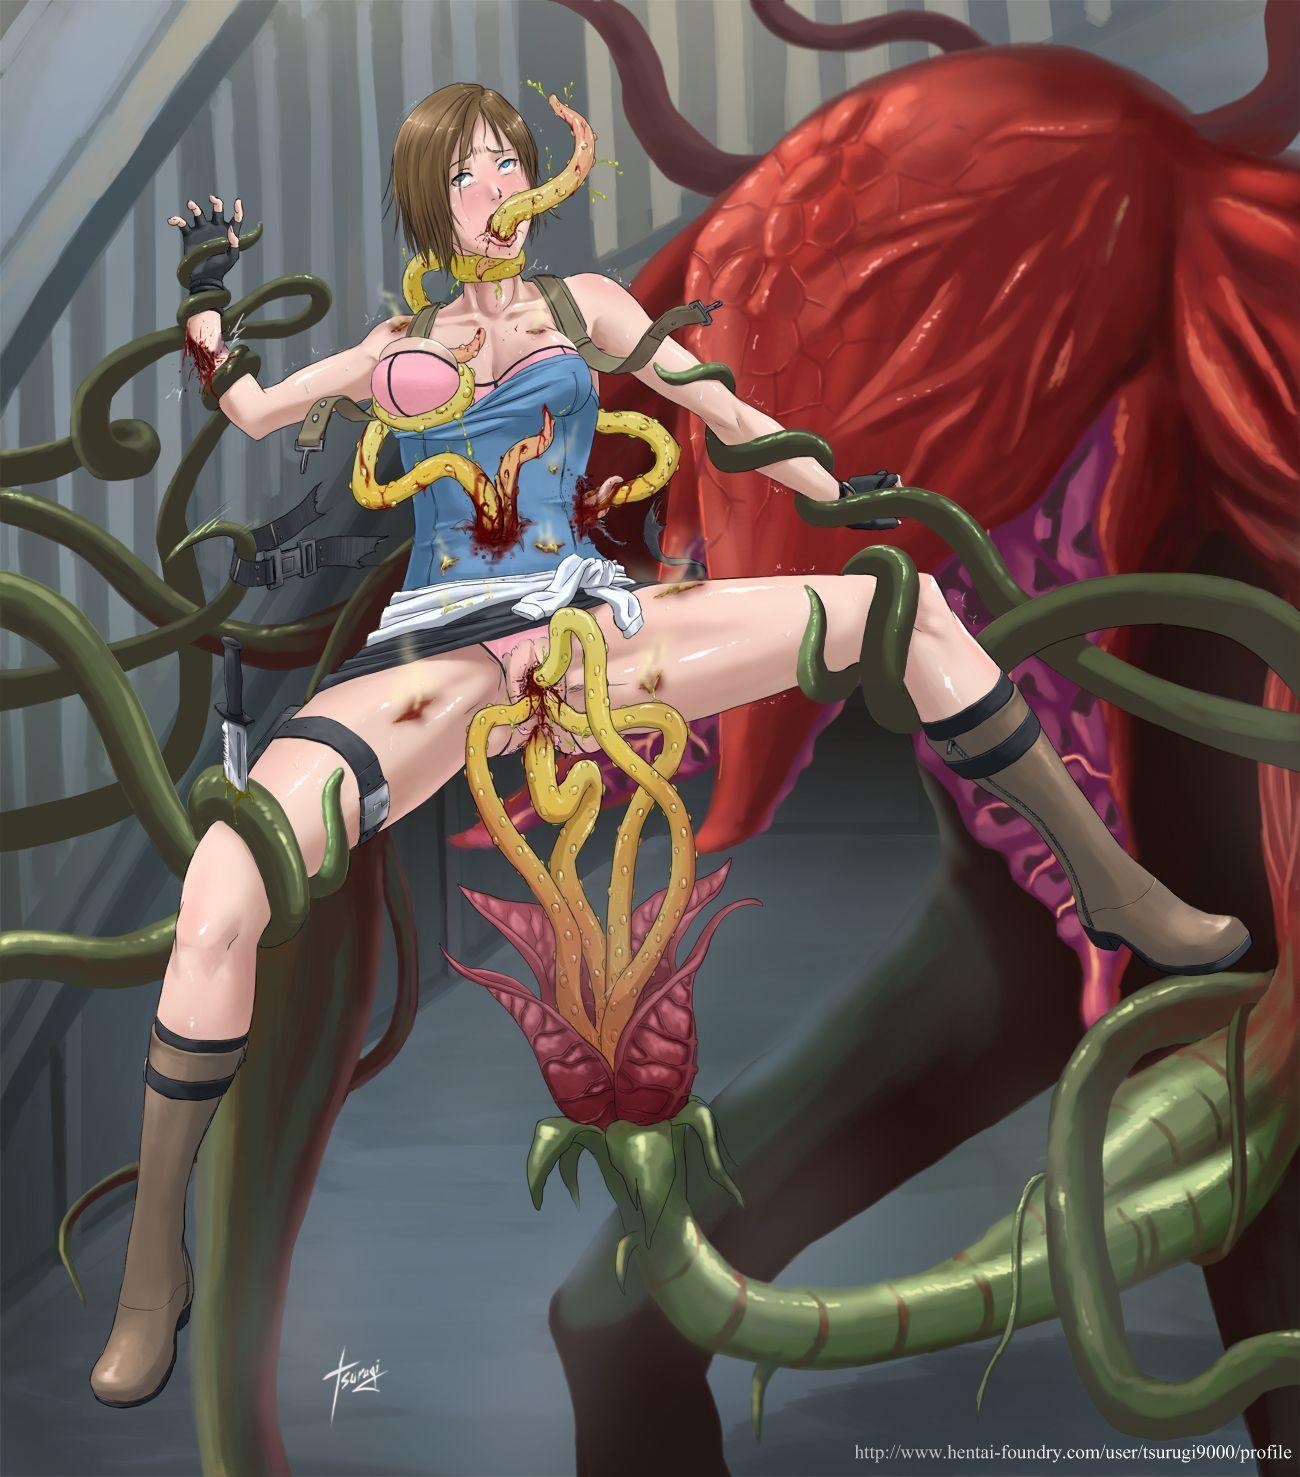 Anime Tentacle Porn Female Pov hentai death tentacles - porn images. comments: 3